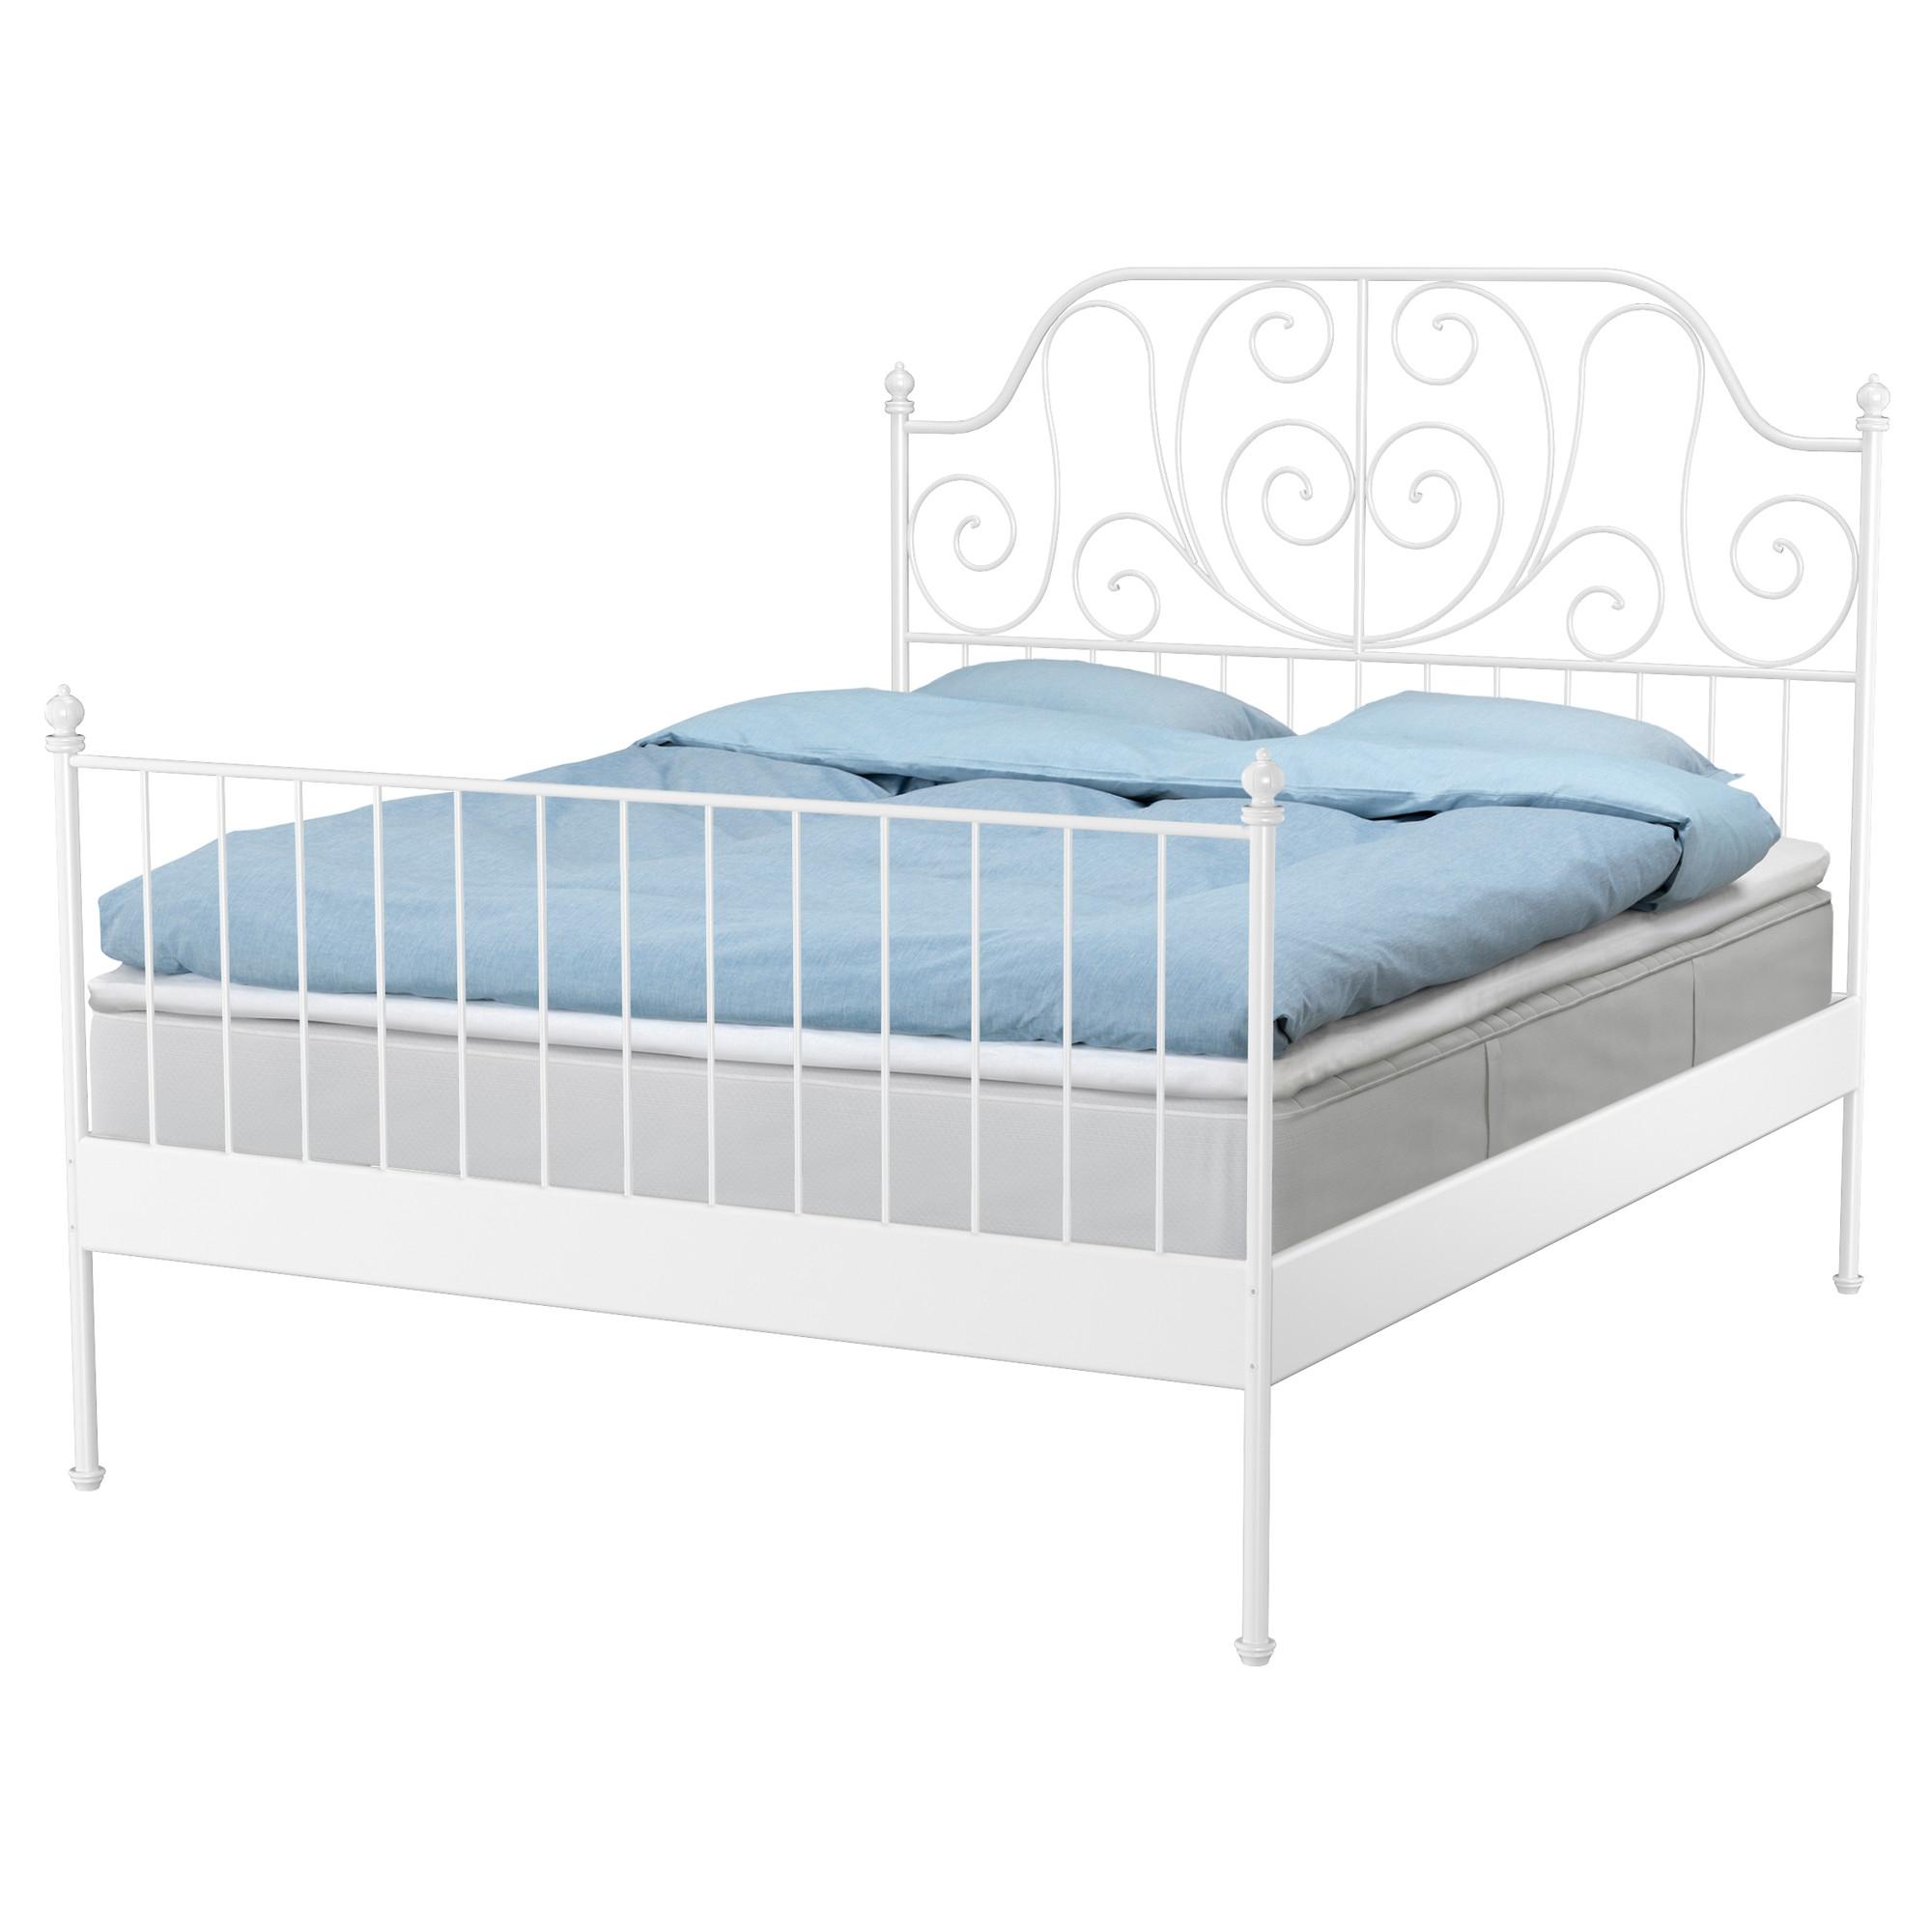 LEIRVIK cabecera/pies de la cama queen